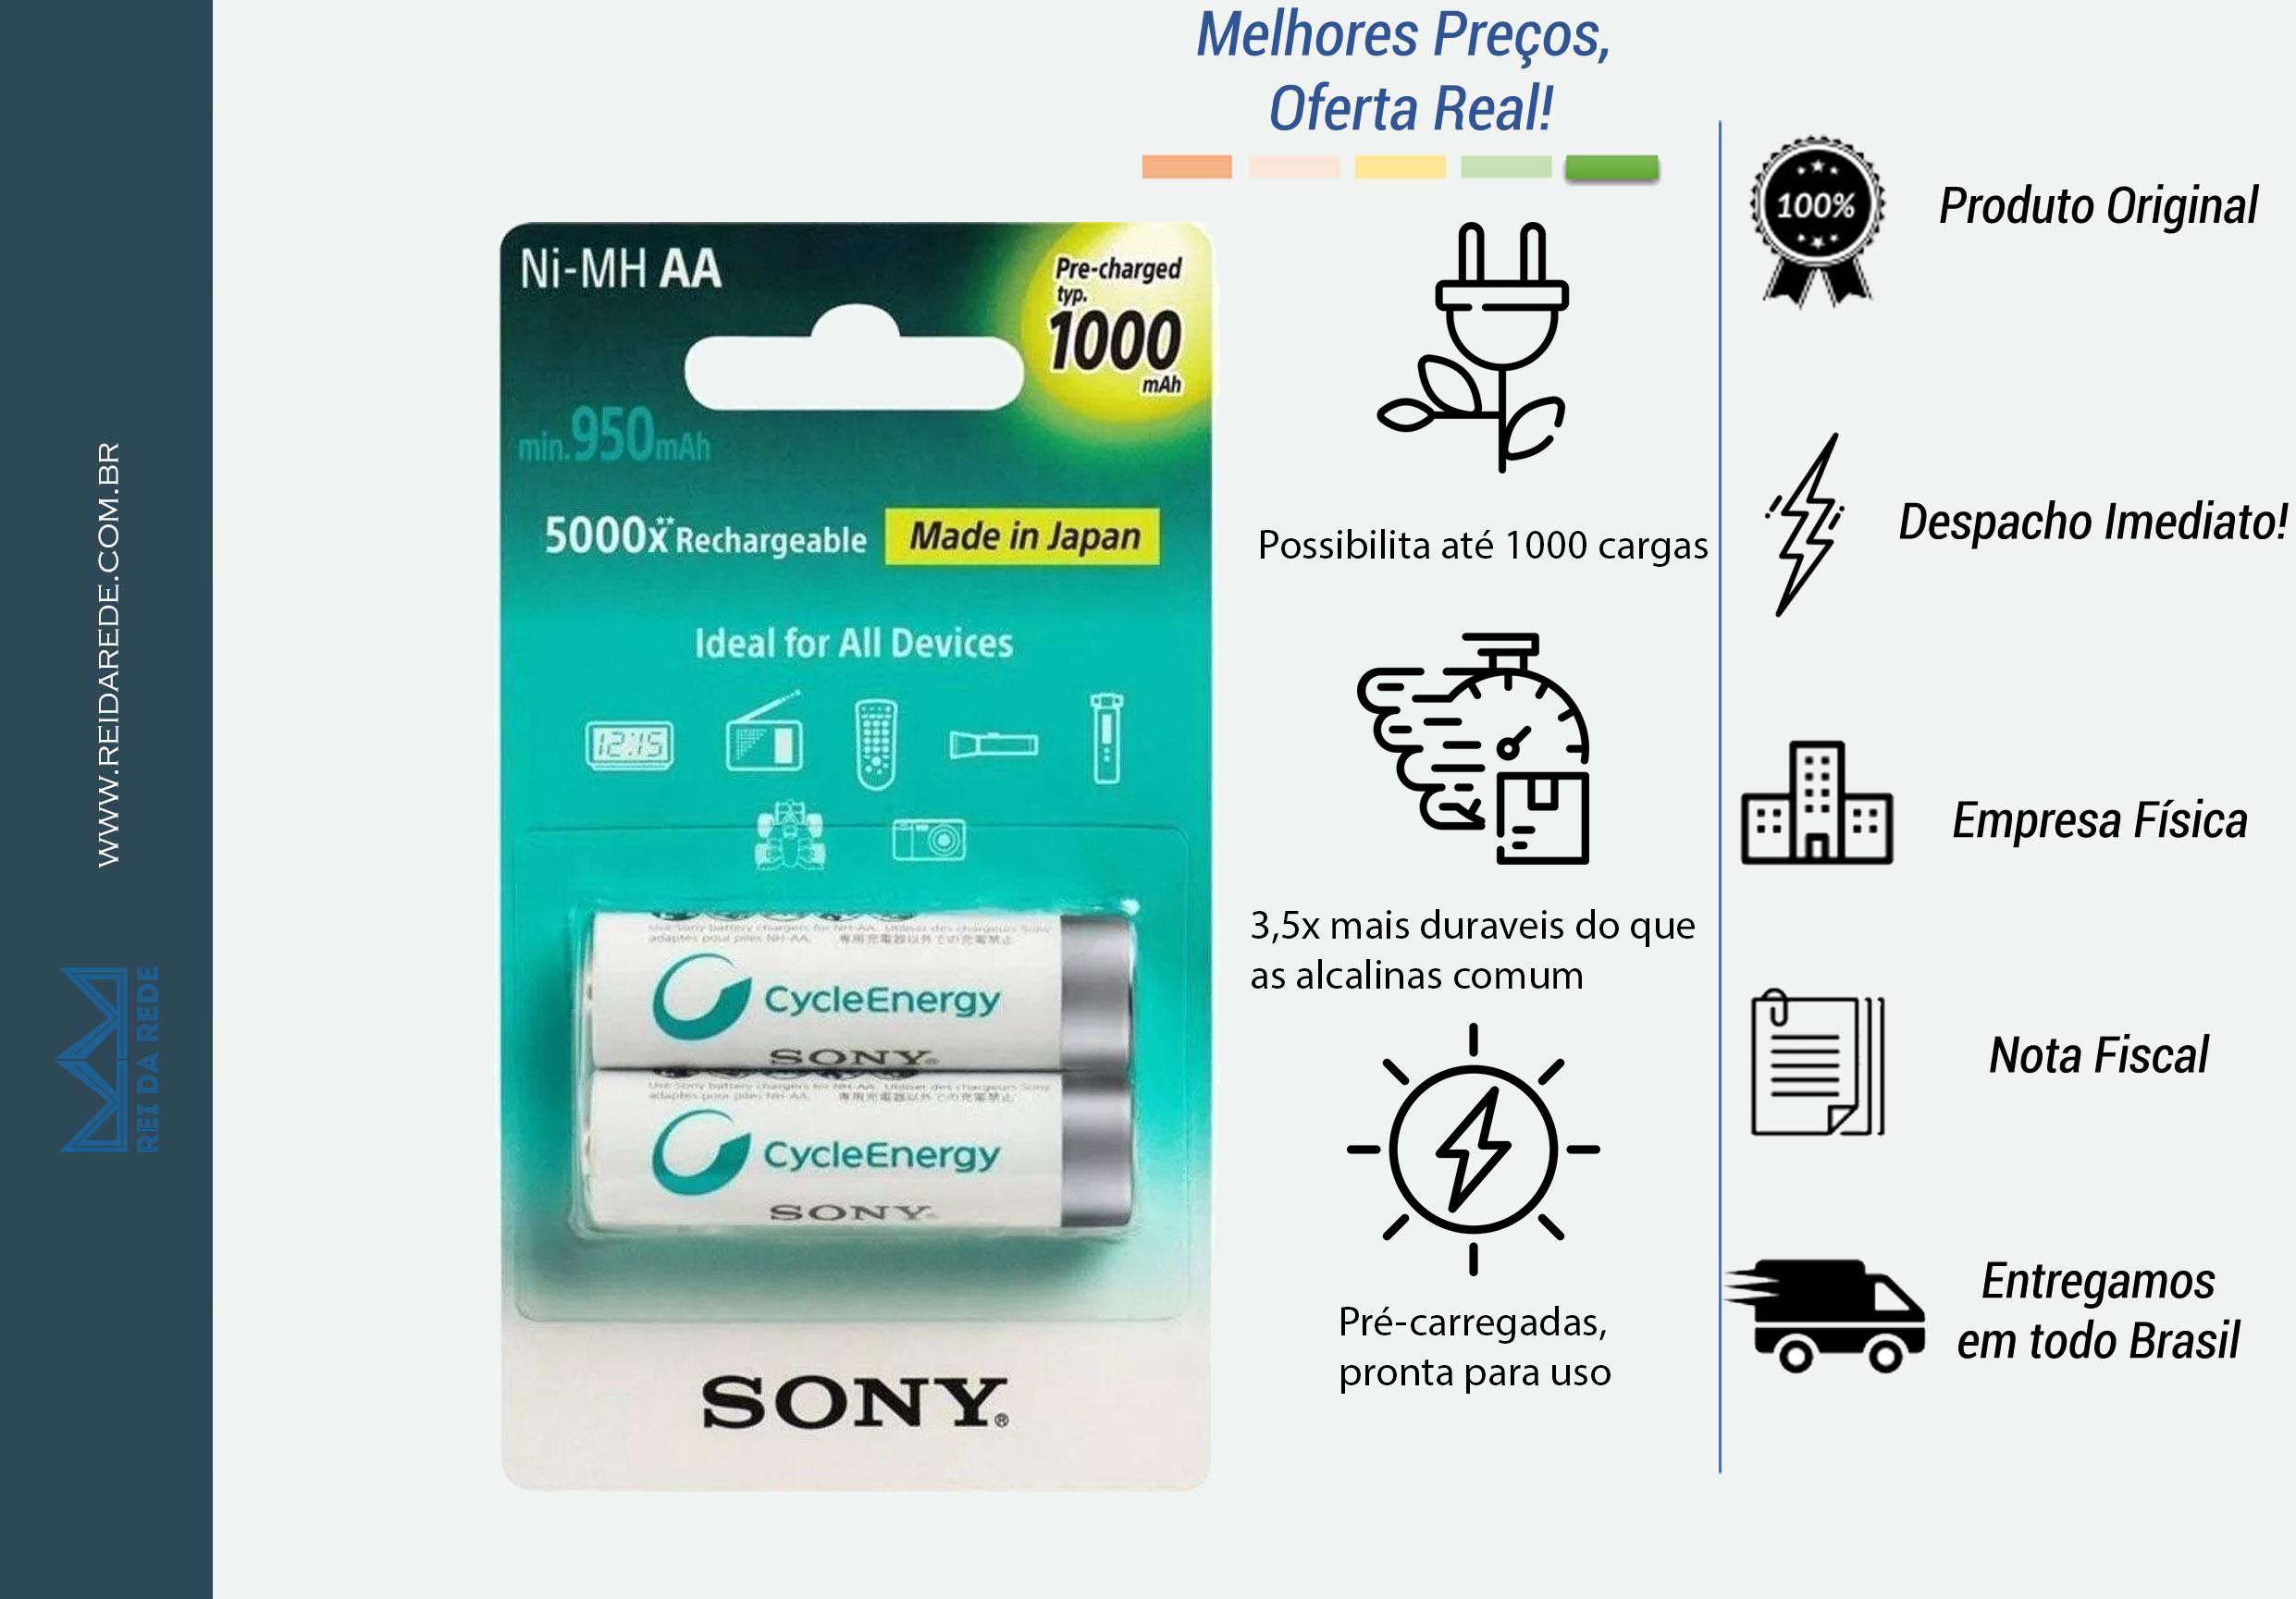 PILHA RECARREGAVEL C/2 PILHAS AA CYCLE ENERGY MULTI USE NH-AA-B2RN SONY - MARCA:SONY - MODELO: NH-AA-B2RN